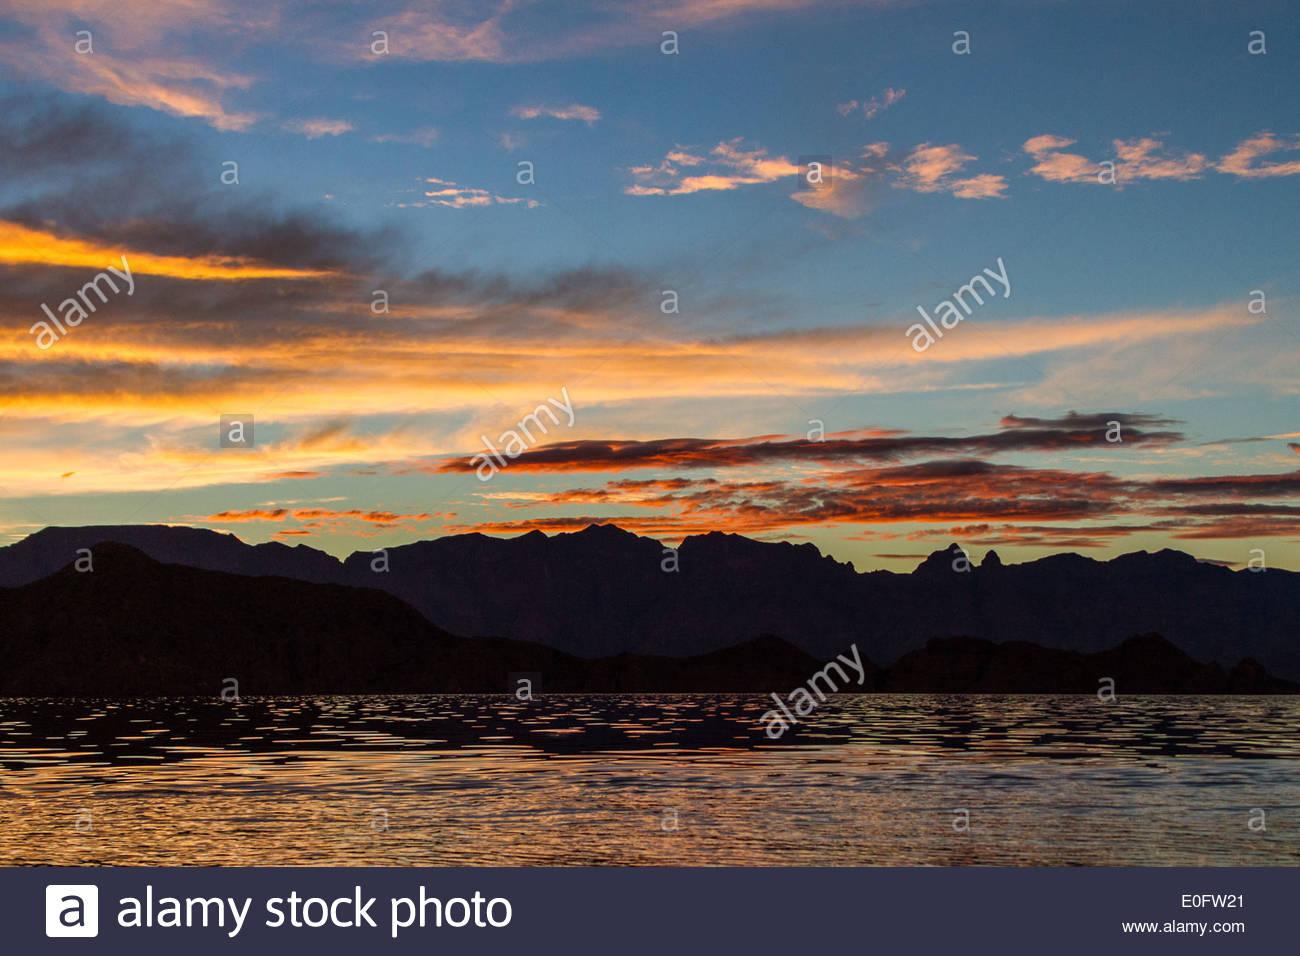 Sunrise over the Baja Peninsula of Mexico - Stock Image